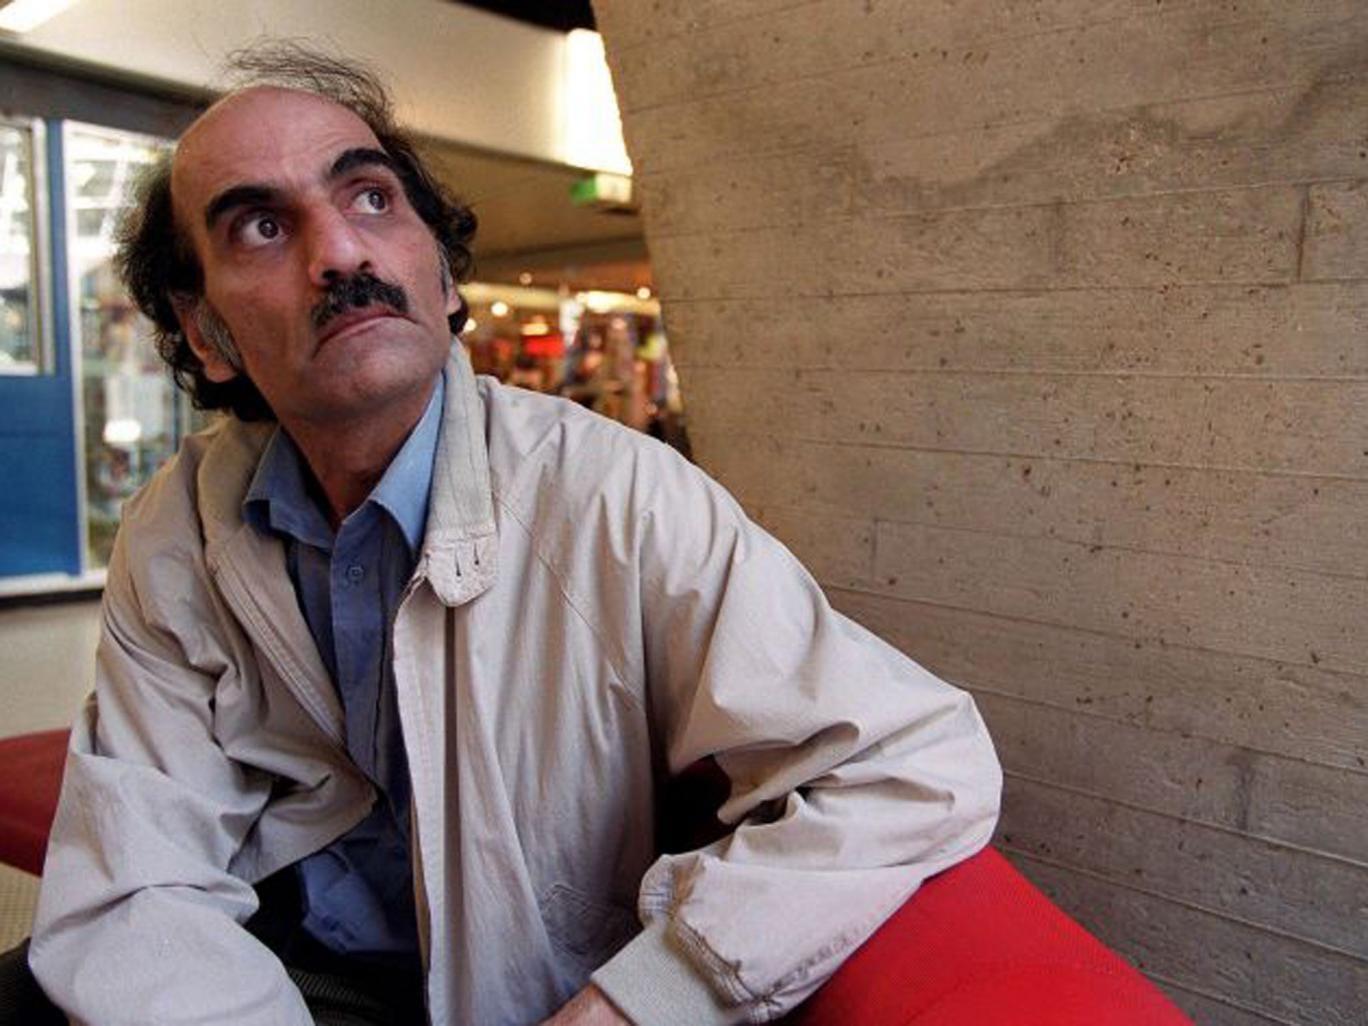 Mehran Karimi Nasseri: He managed to spend 18 years at Terminal 1 of Paris's Charles de Gaulle airport